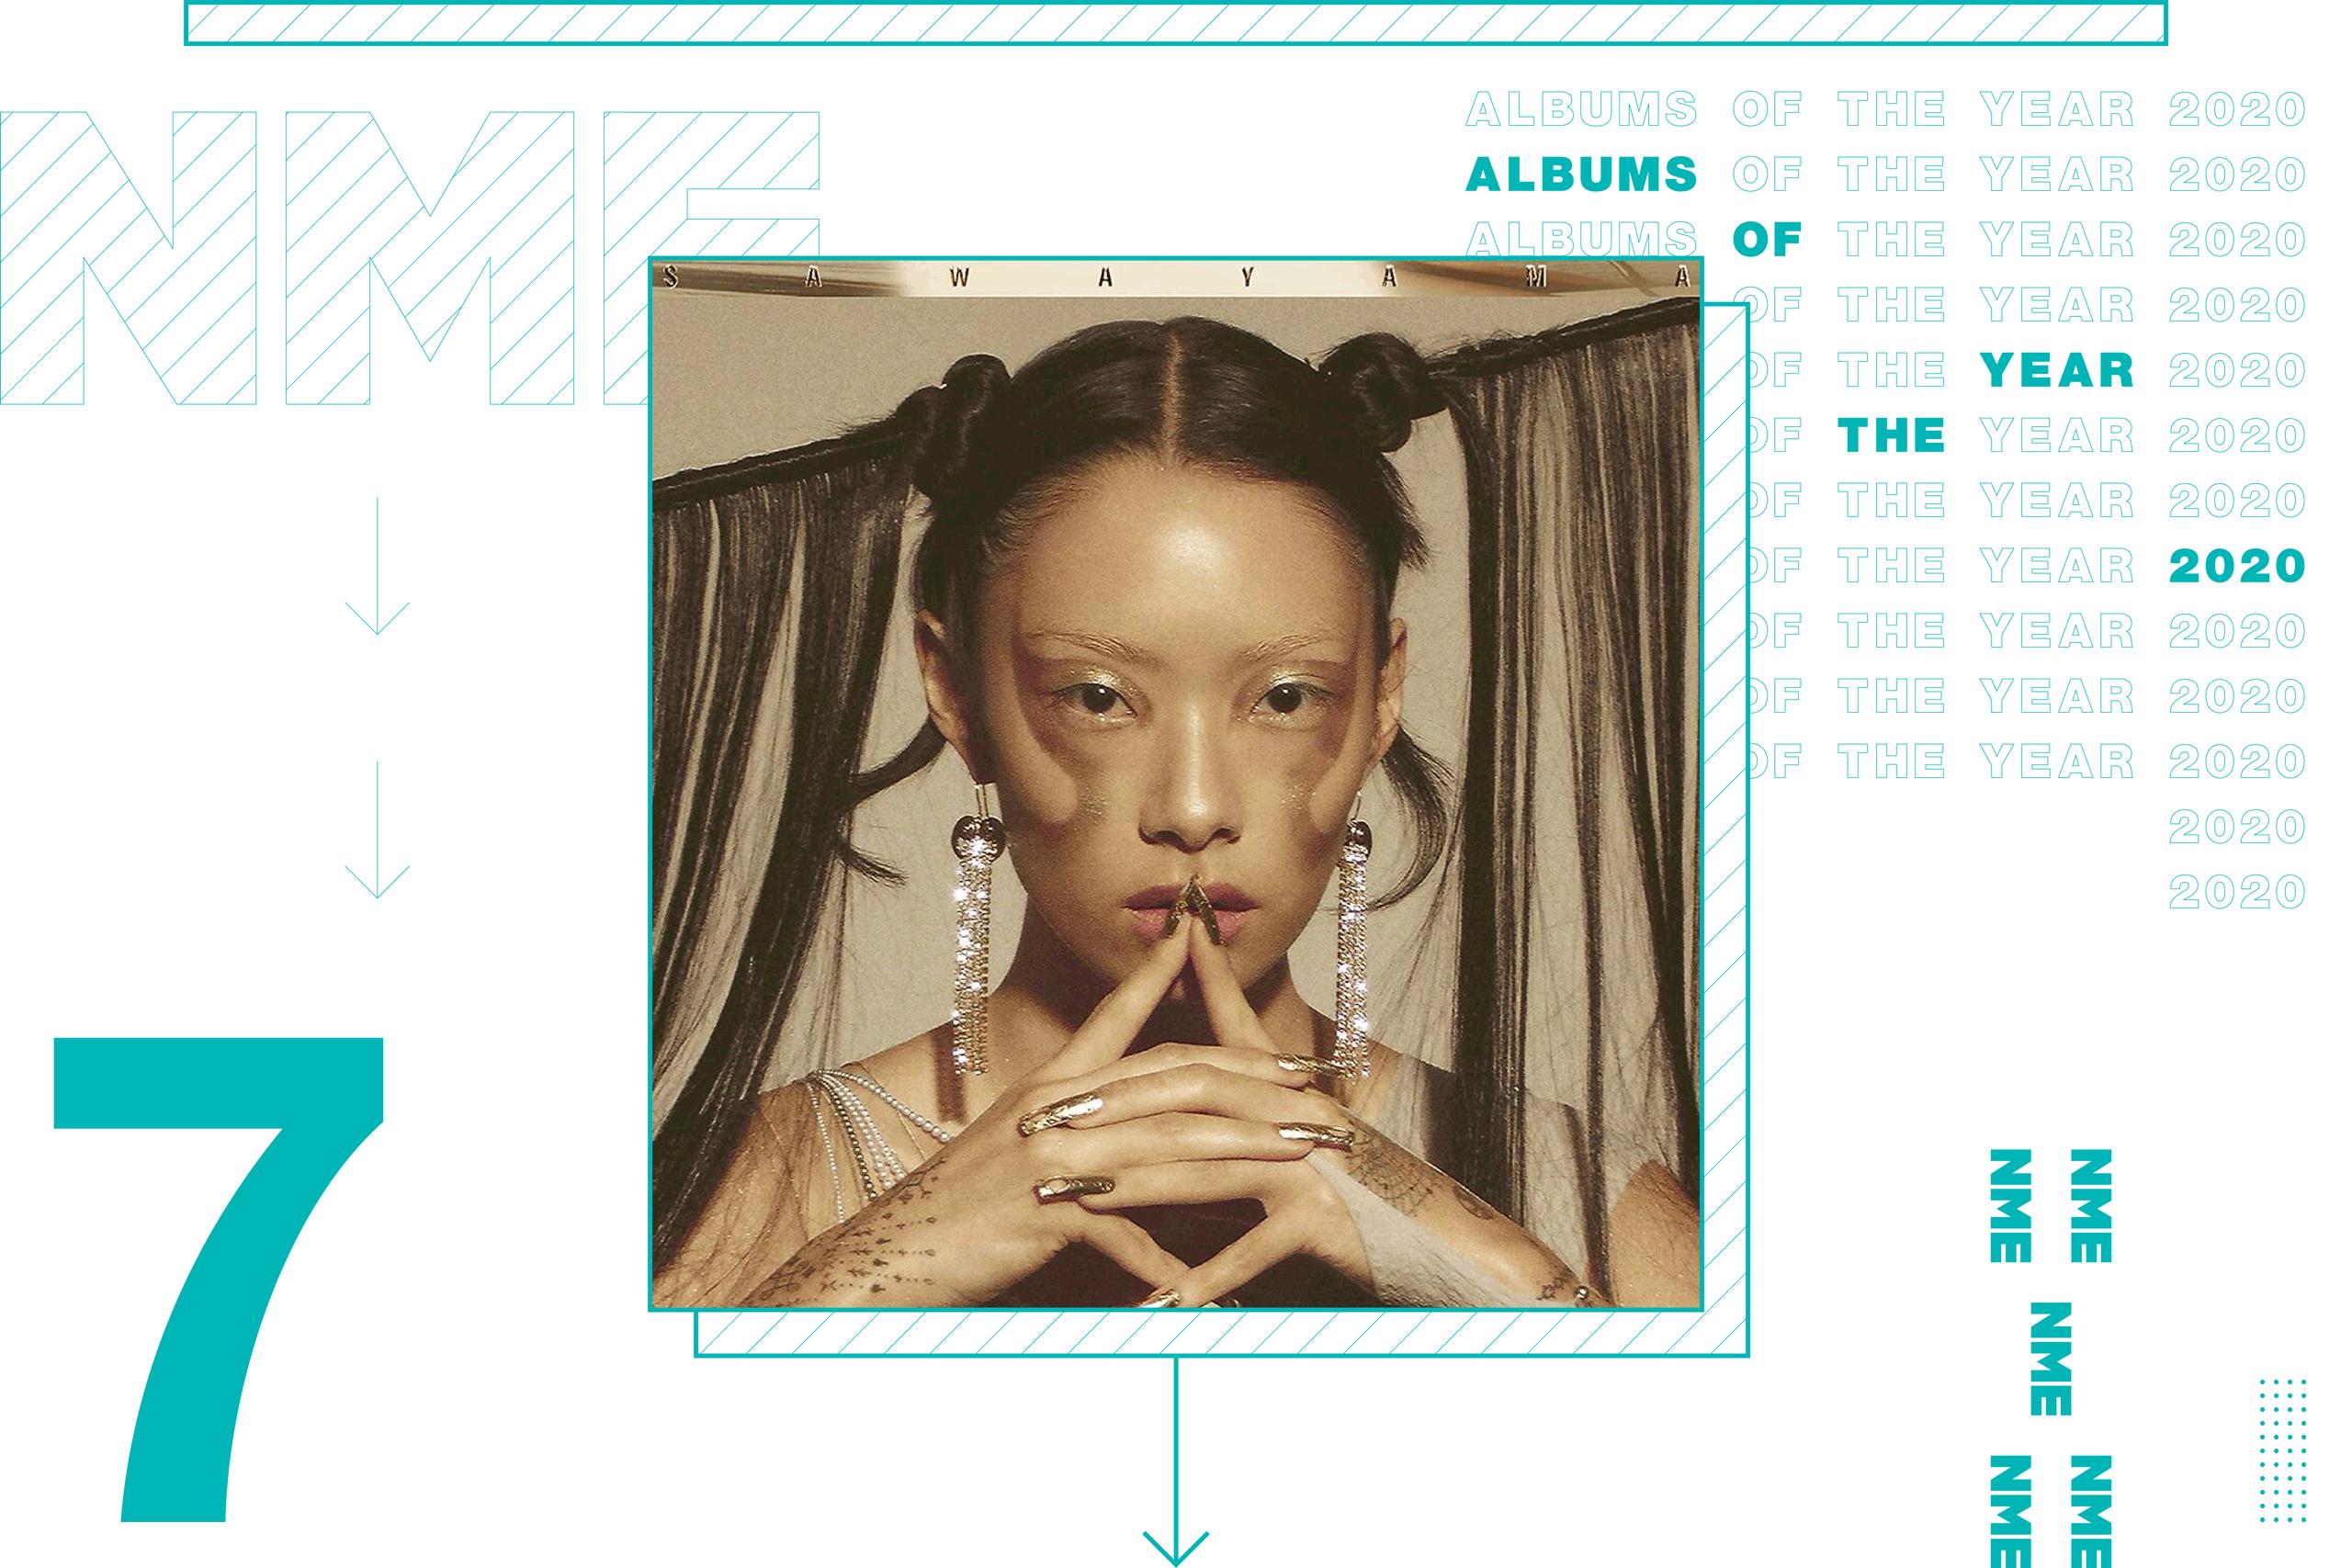 NME Album Of The Year 2020 Rina Sawayama – 'SAWAYAMA'